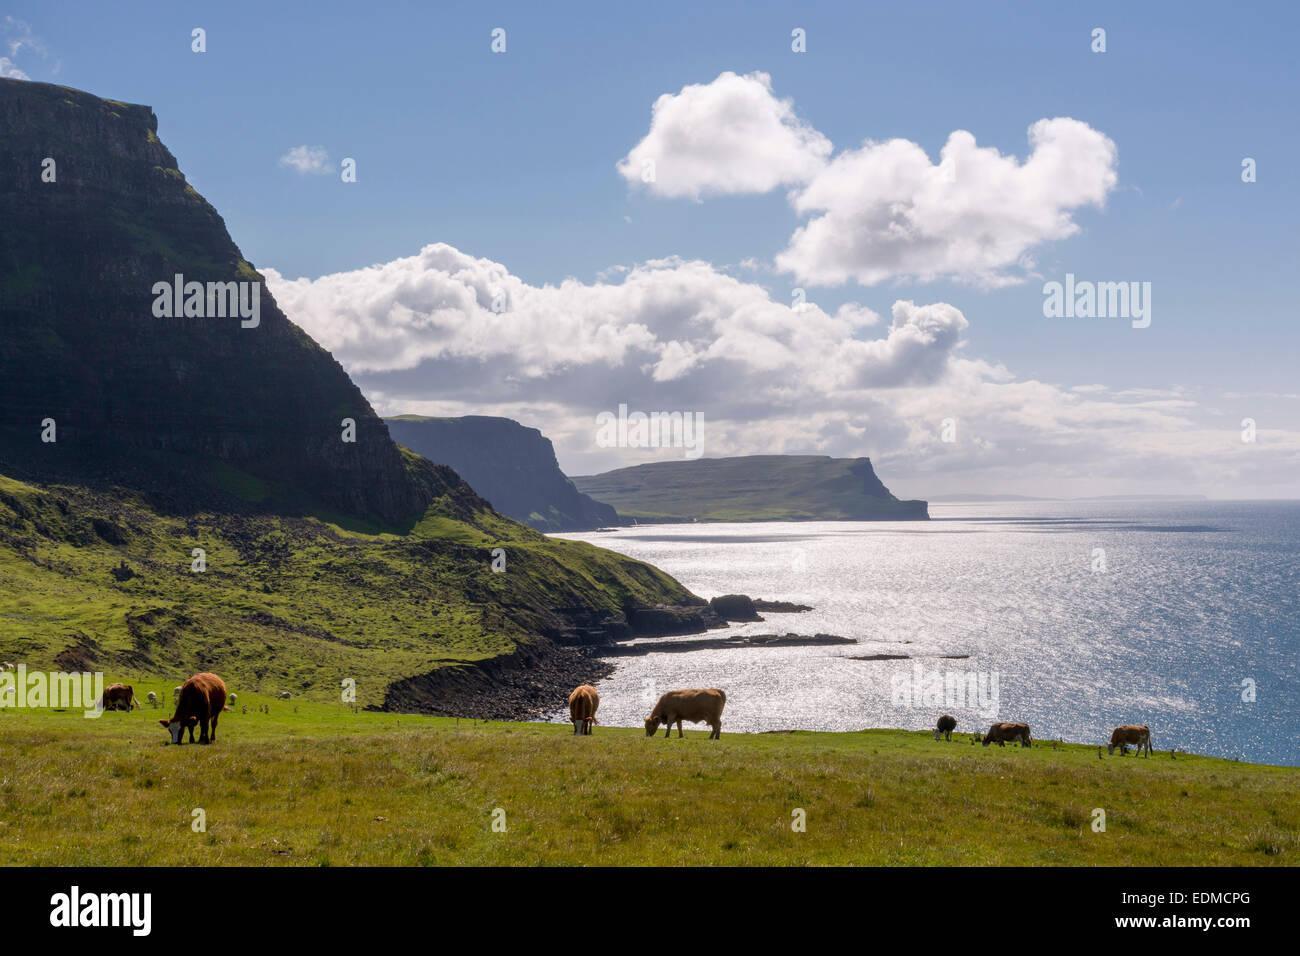 El pastoreo de ganado en neist skye pouint Foto de stock